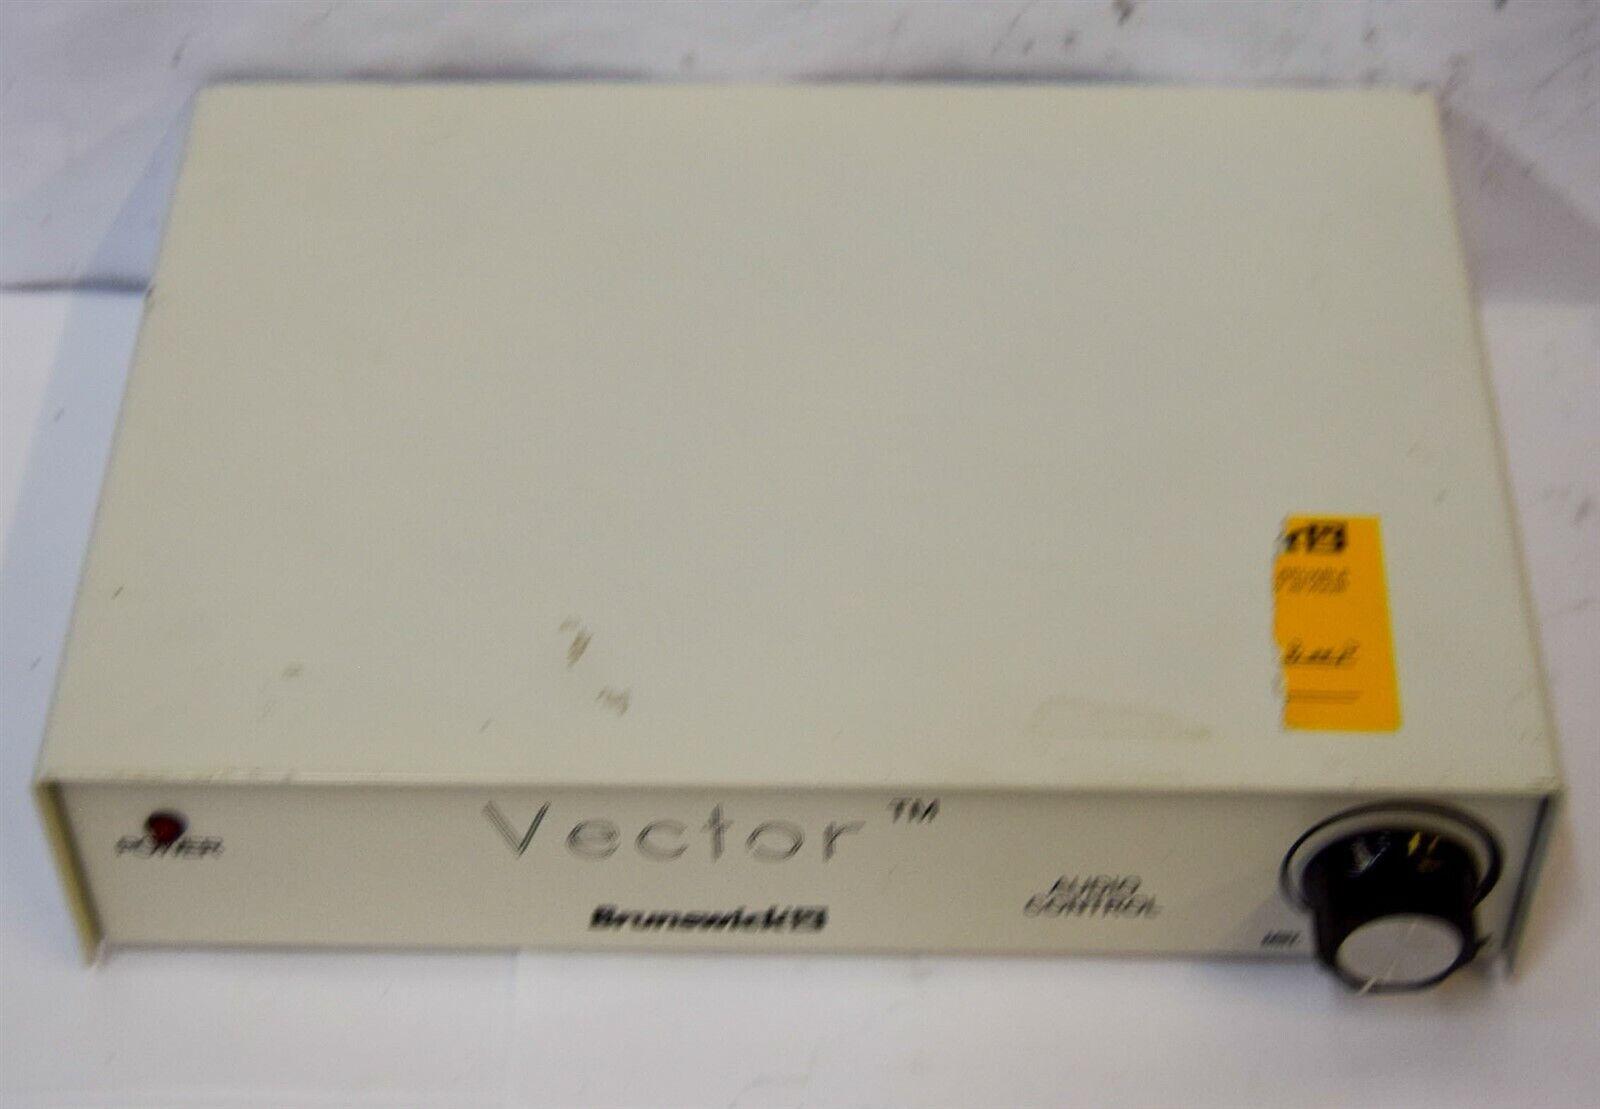 Brunswick Vector 57-301174 Bowling Alley Audio Control CMS (no ac adptr)